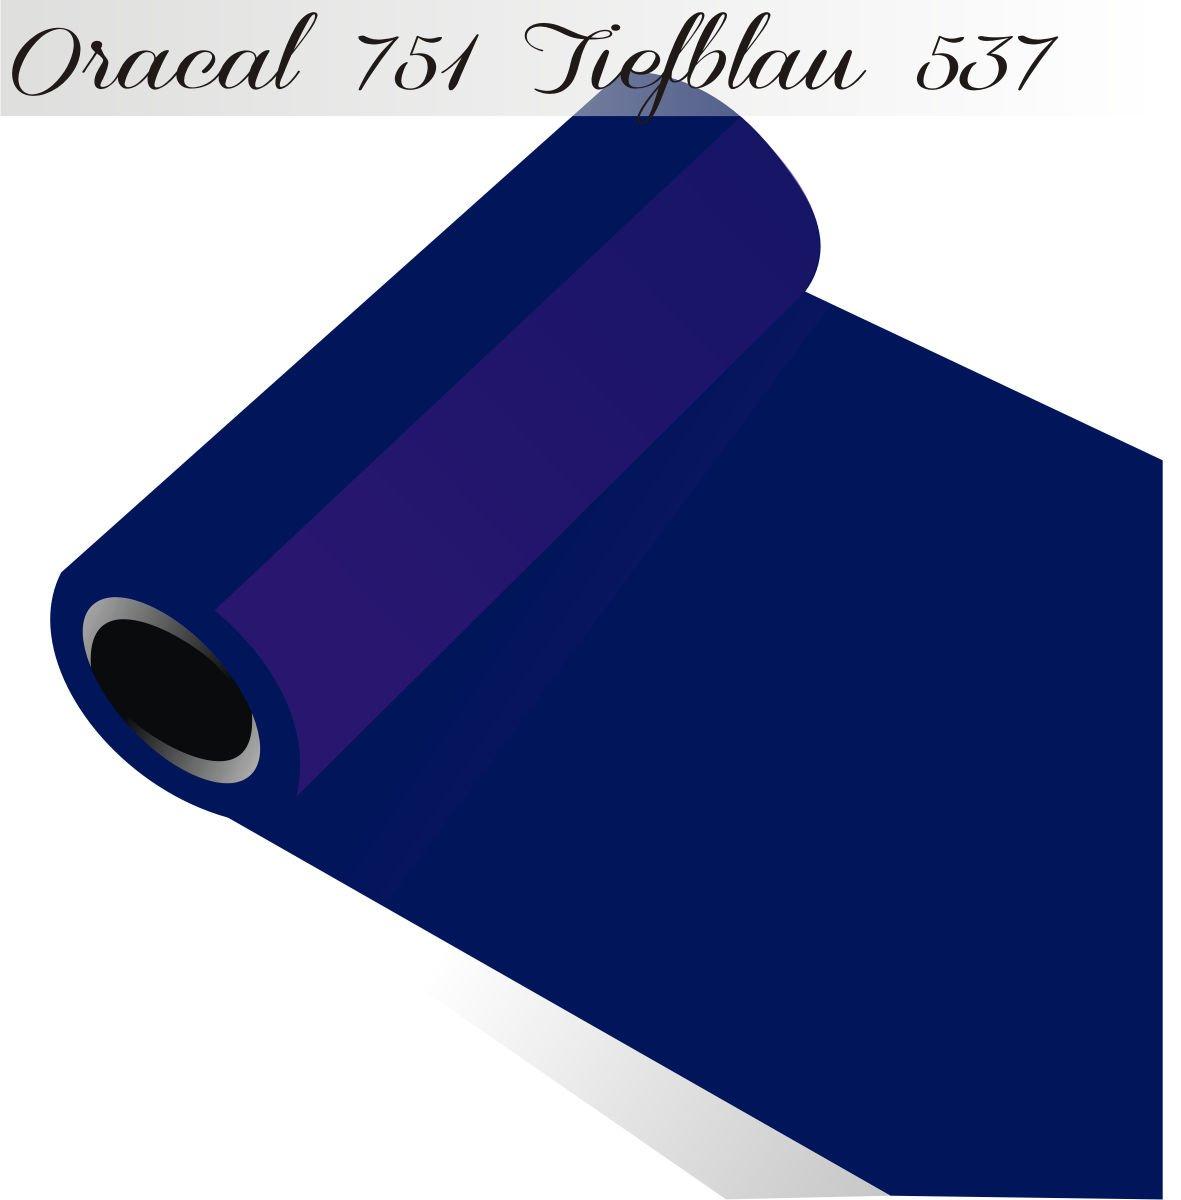 Oracal 751 PVC Film Orafol Foil 5 m (Running Metres) Choose 118 Glossy Colours – In 4 sizes 100 cm 537 Predector Height Dark bluee